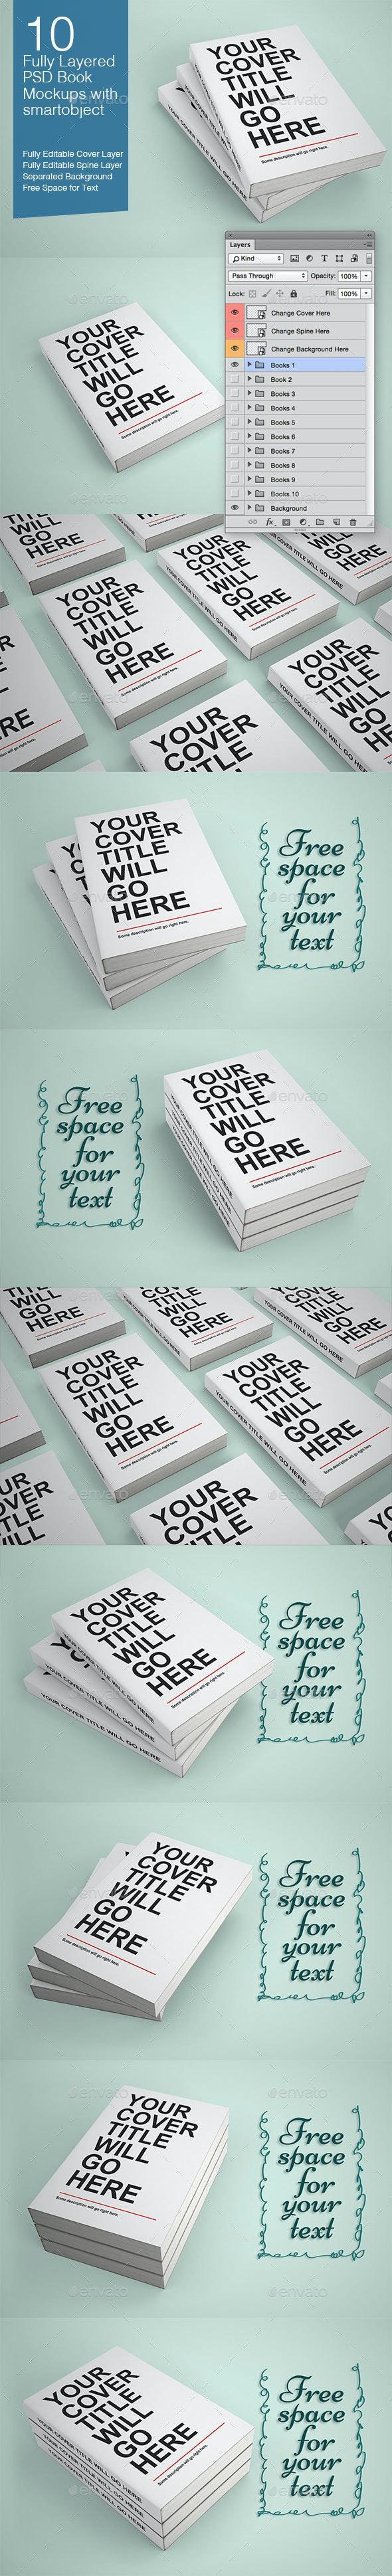 Book Mock-ups - 10 Poses - Books Print